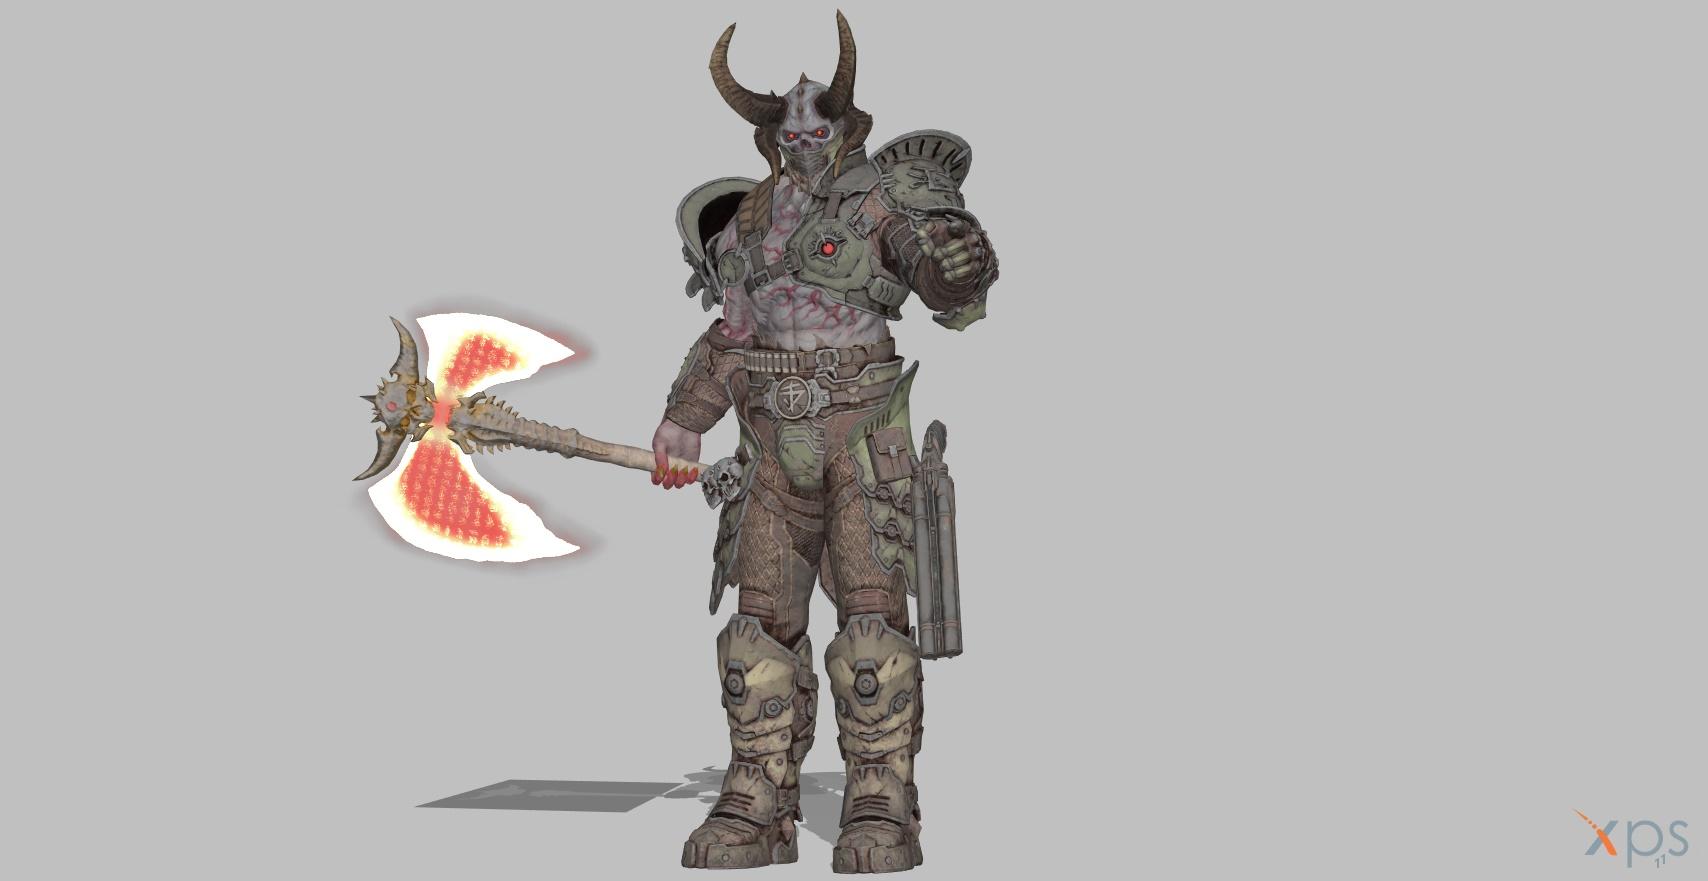 Doom Eternal Marauder By Blinkjisooxps On Deviantart